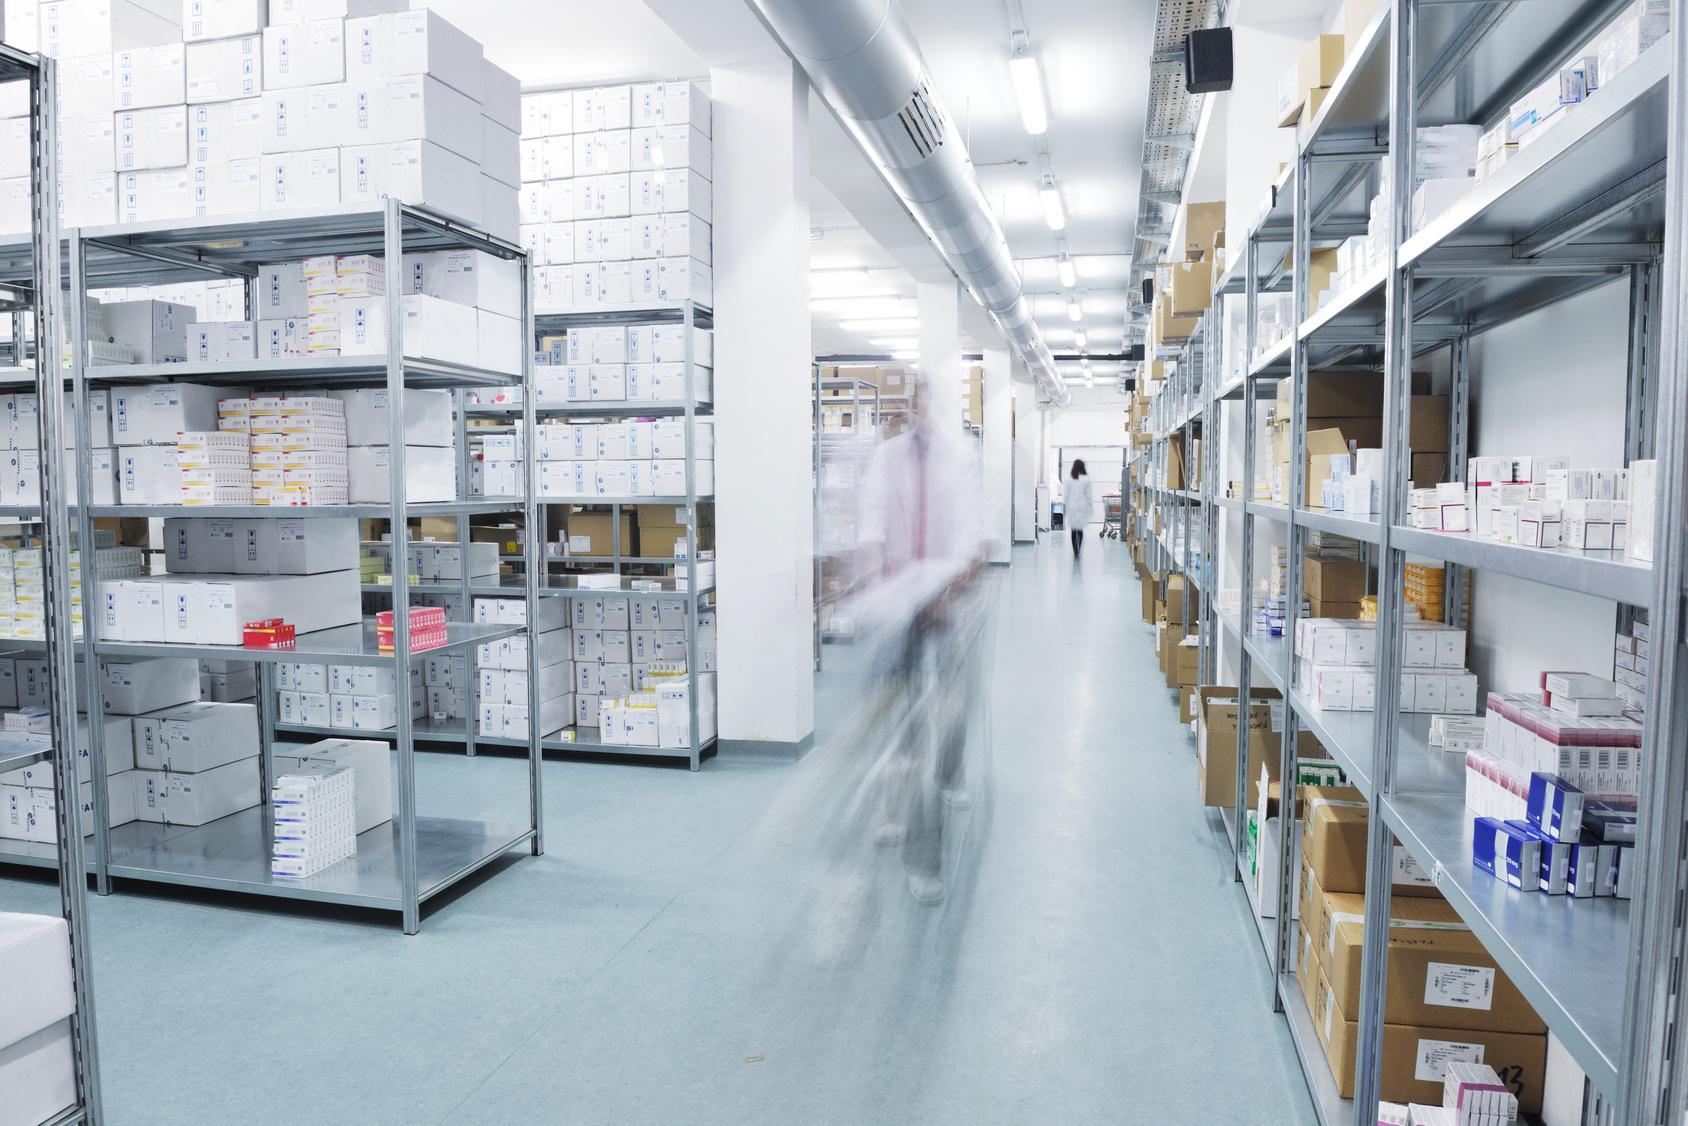 Global Pharmaceutical Warehousing Market 2018 – DB Schenker, DHL, Kuehne+Nagel, UPS, Agility, BDP International – Paris Ledger